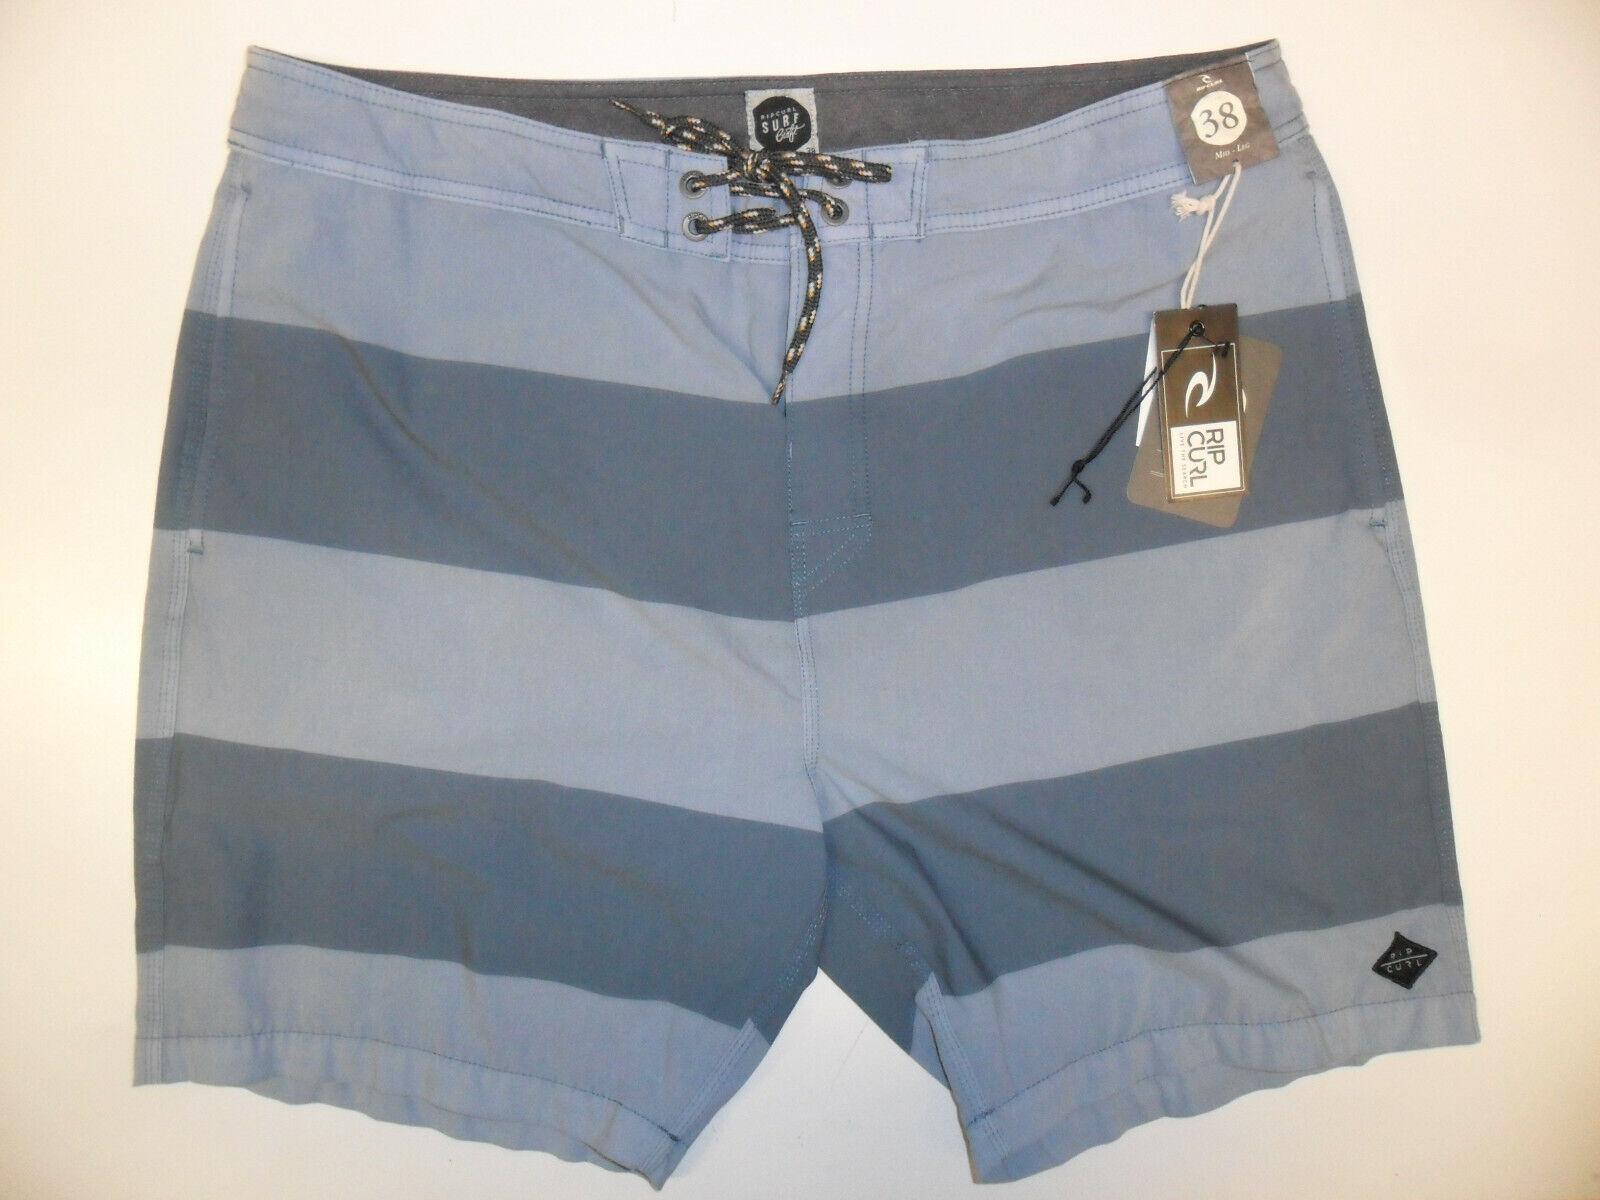 e8713443f2 RIP CURL Men's BOARDWALK - blue - Size 38 - NWT DEPARTED Boardshorts  nsixnm311-Swimwear